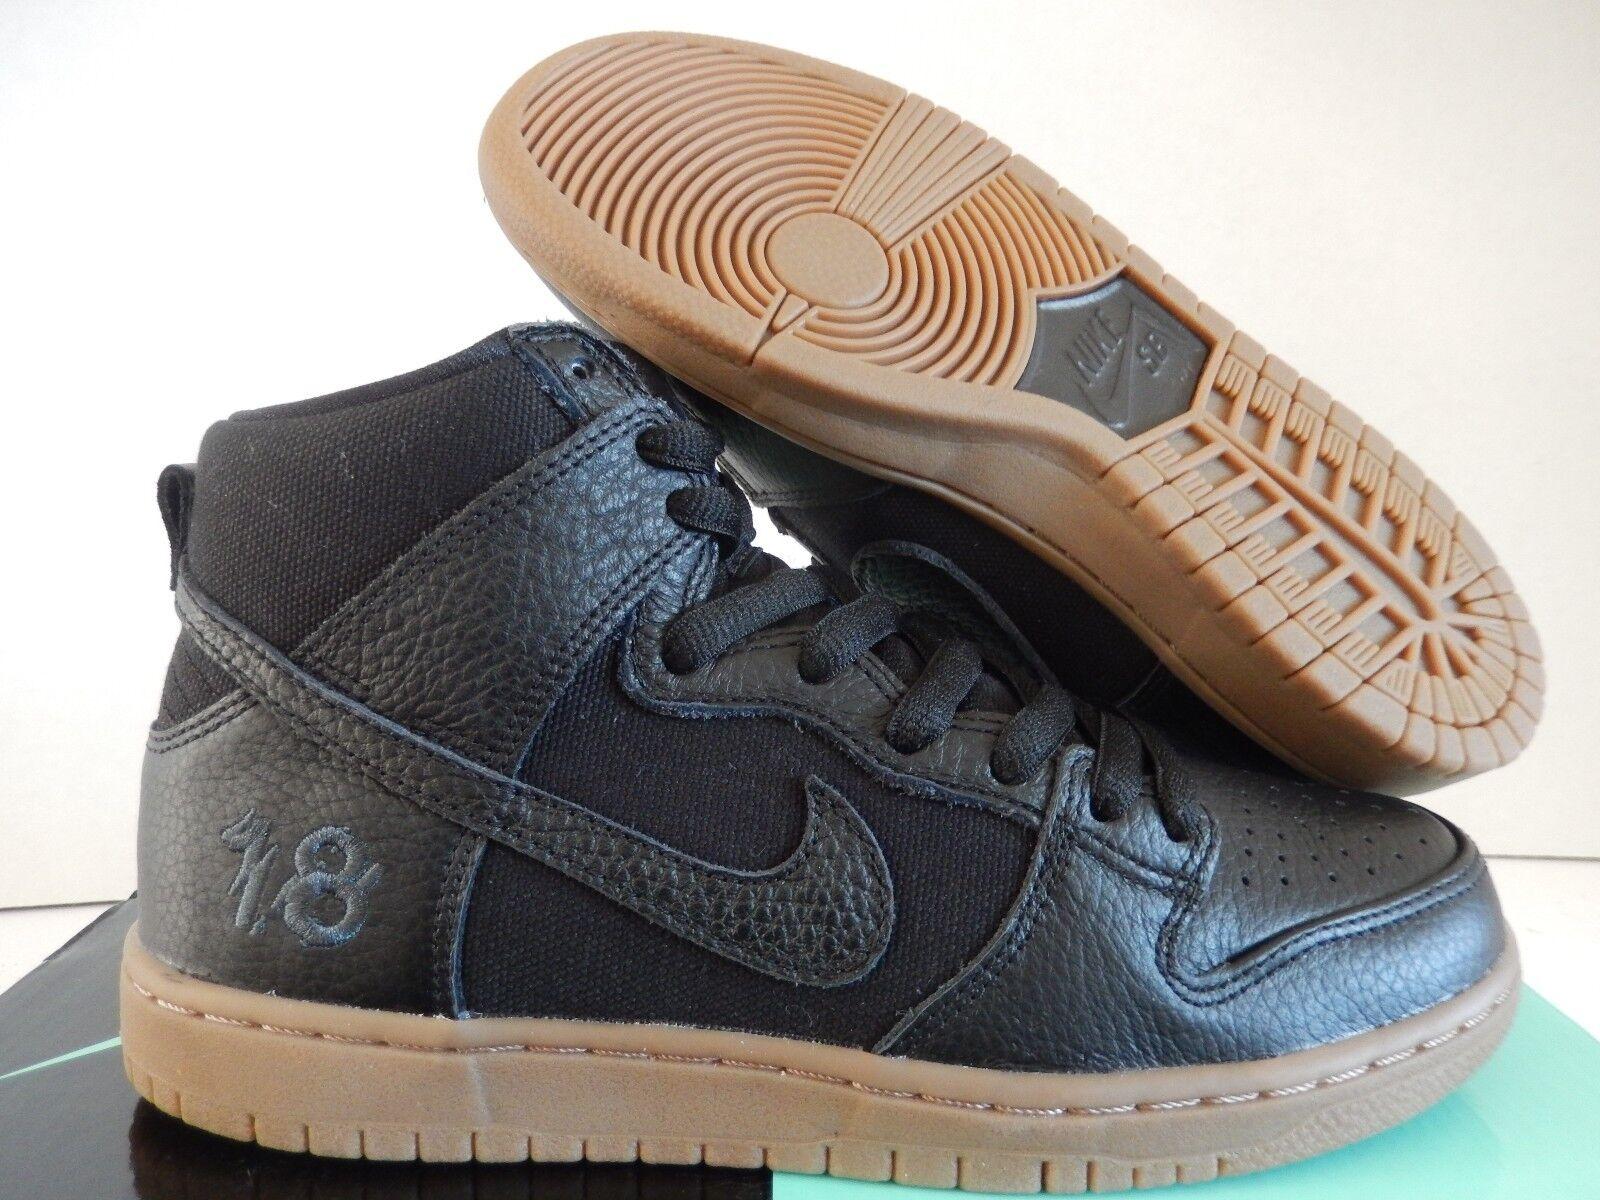 Nike sb qs zoom canestro alto pro qs sb 457416